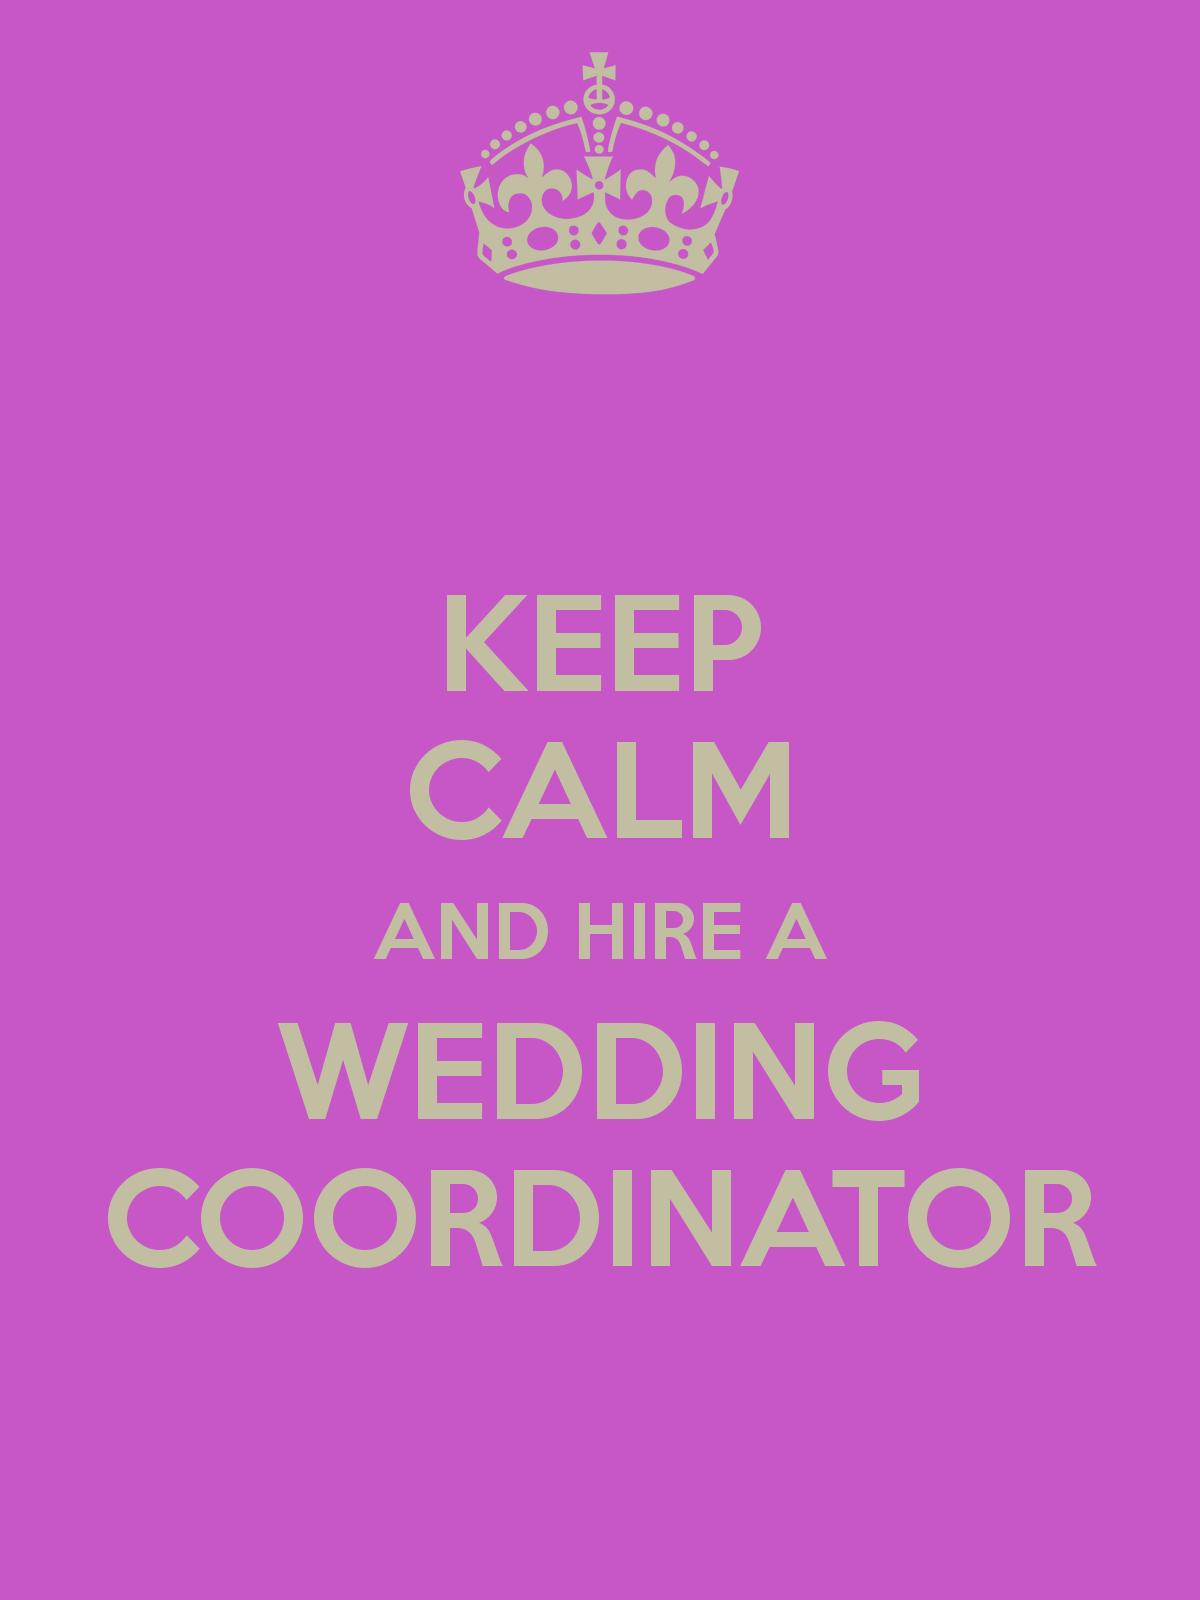 keep-calm-and-hire-a-wedding-coordinator